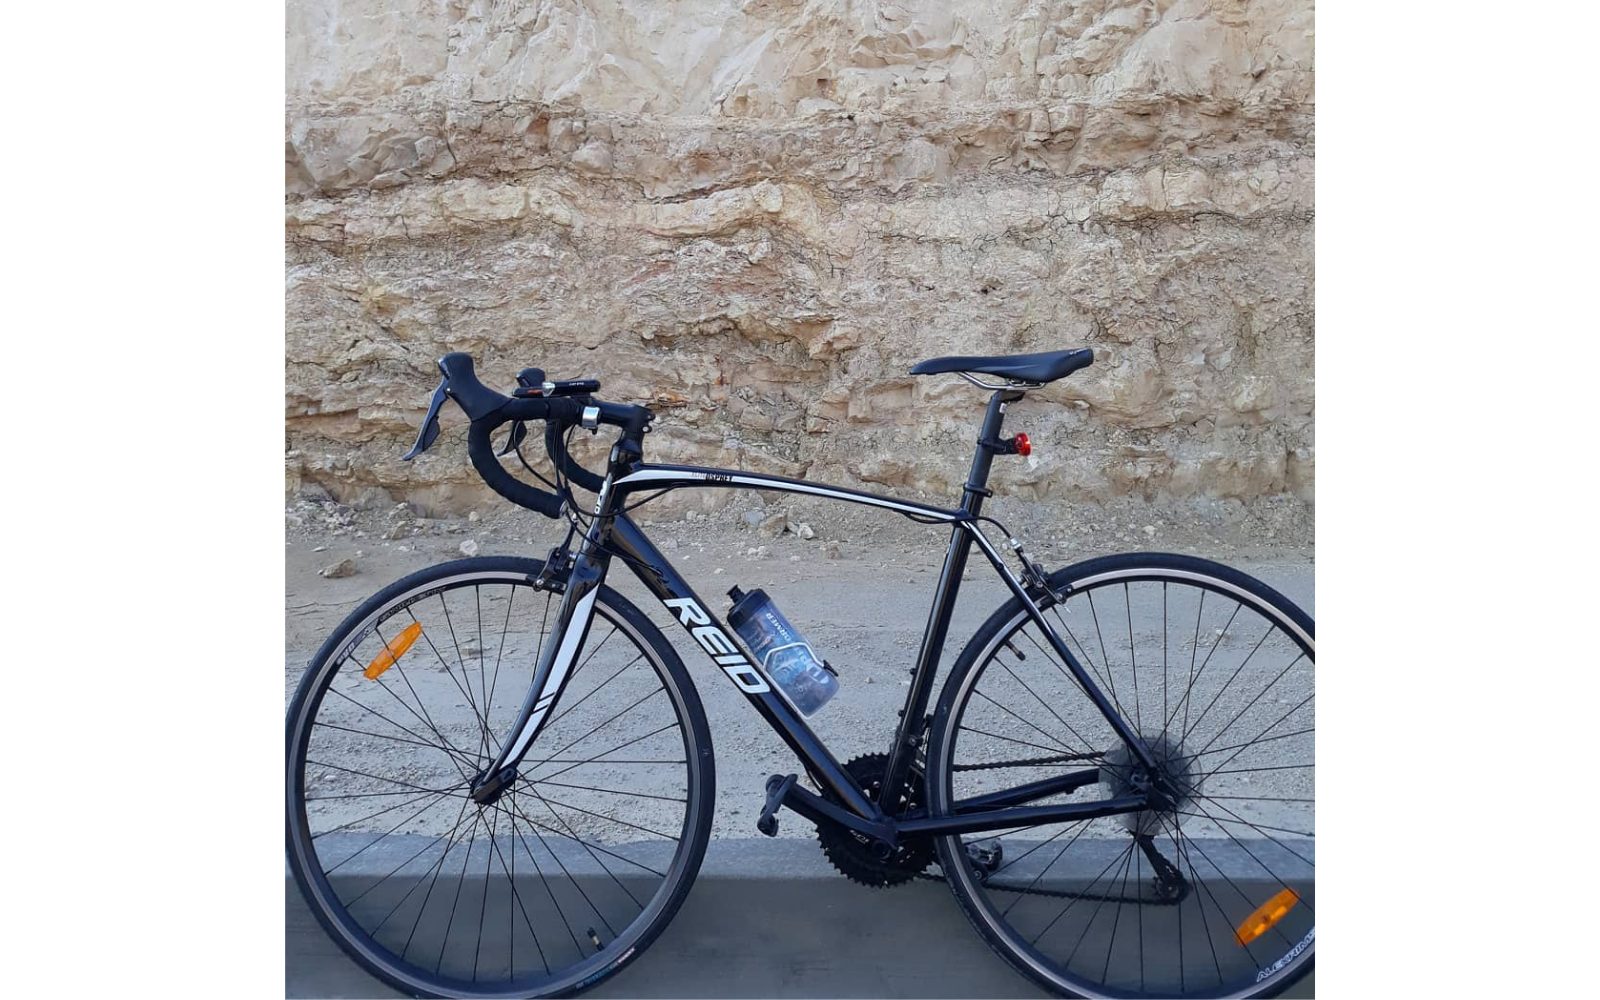 62 3 - Reid ® - Osprey Drop Bar Bike